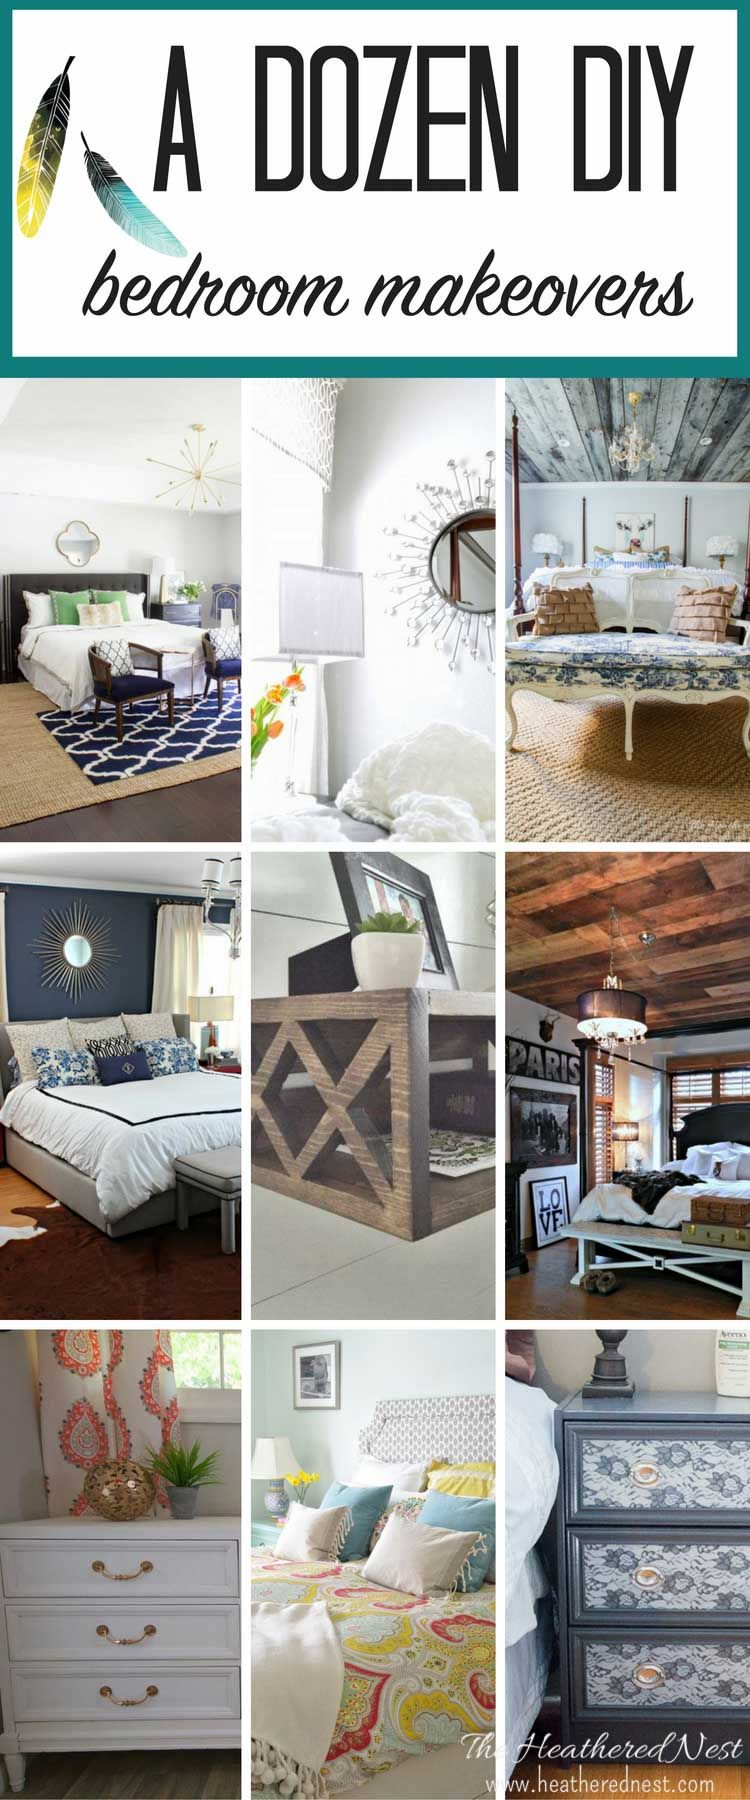 Bedroom Boards Ideas Collection a dozen diy bedroom ideas | diy bedroom, ceilings and barn